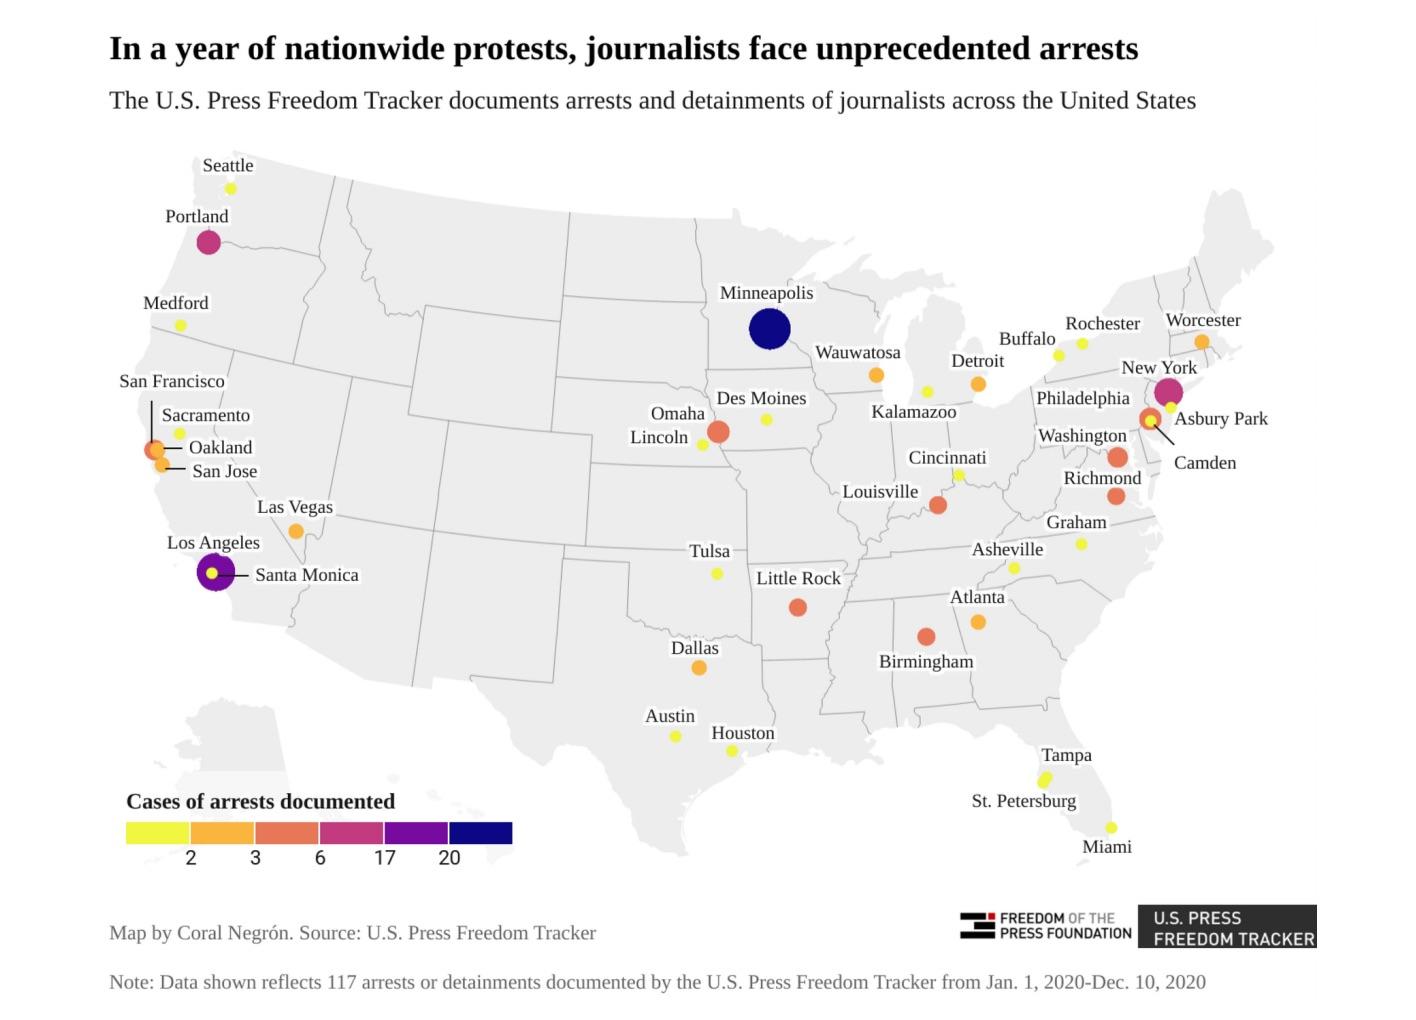 U.S. Press Freedom Tracker